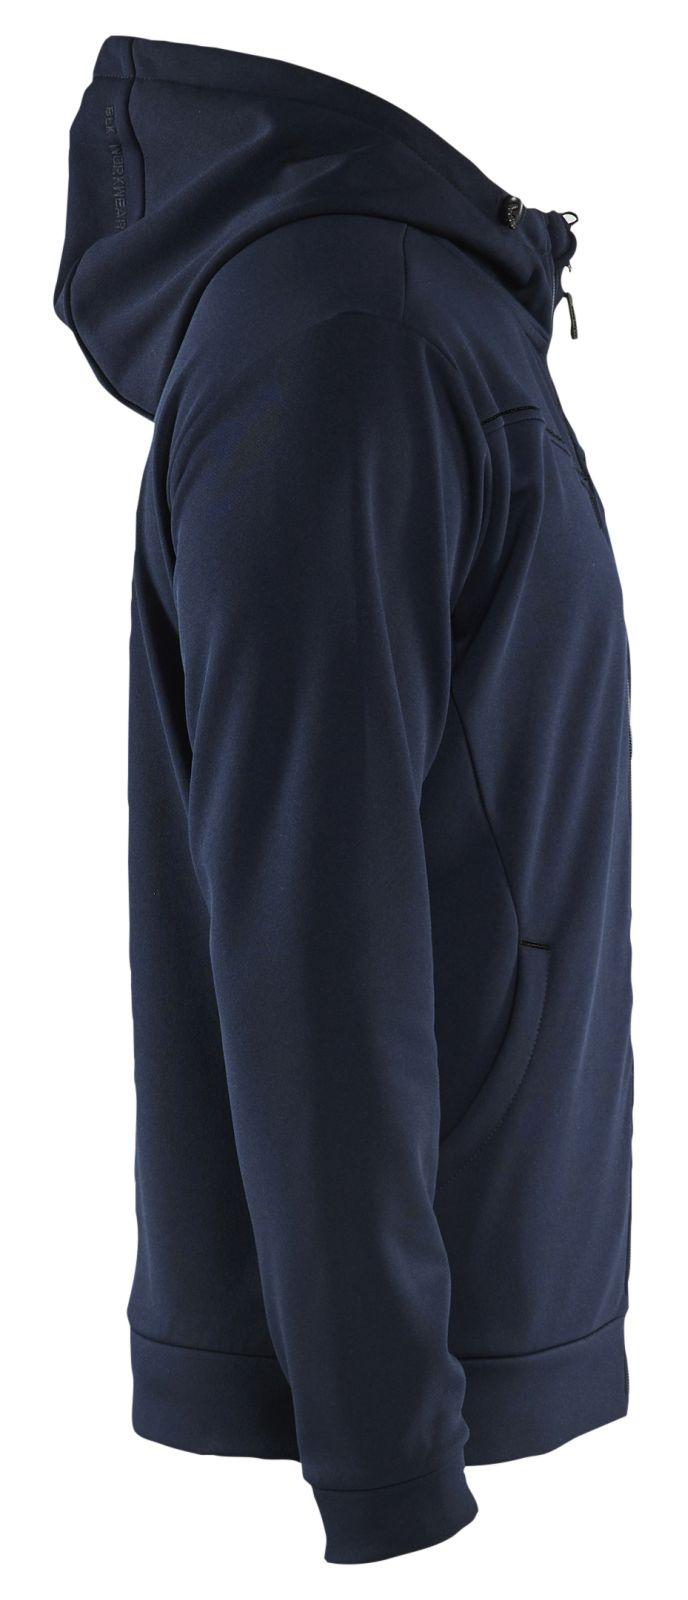 Blaklader Hooded sweatvesten 33632526 donker marineblauw-zwart(8699)